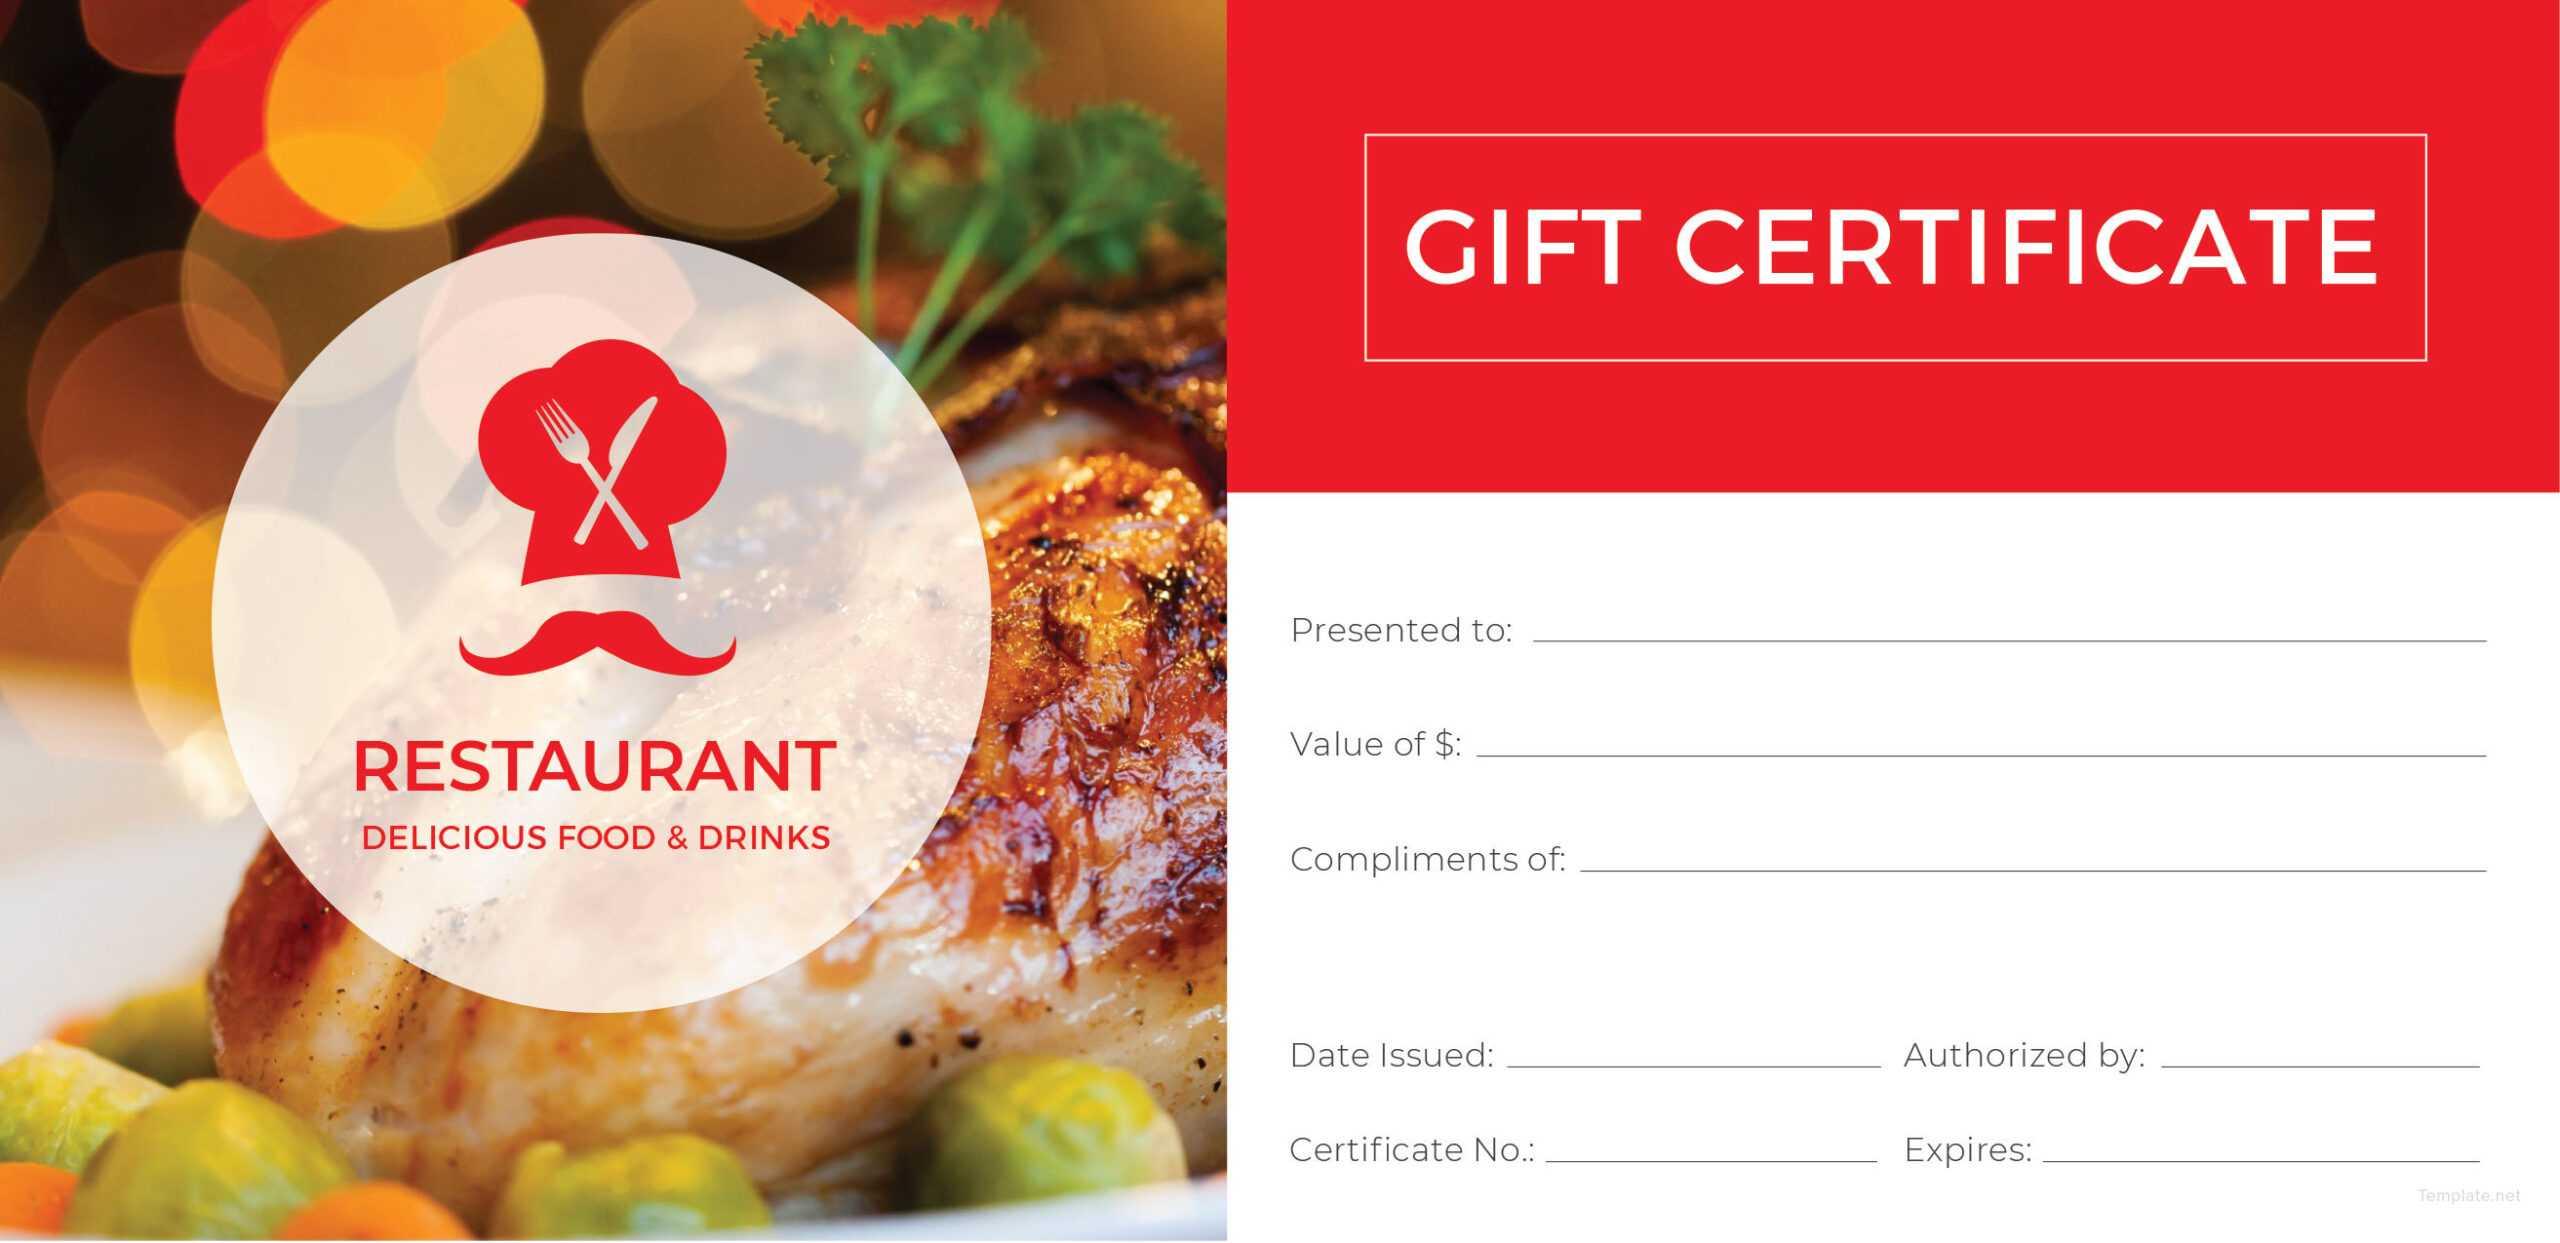 003 Restaurant Gift Certificates Templates Template Ideas With Regard To Restaurant Gift Certificate Template